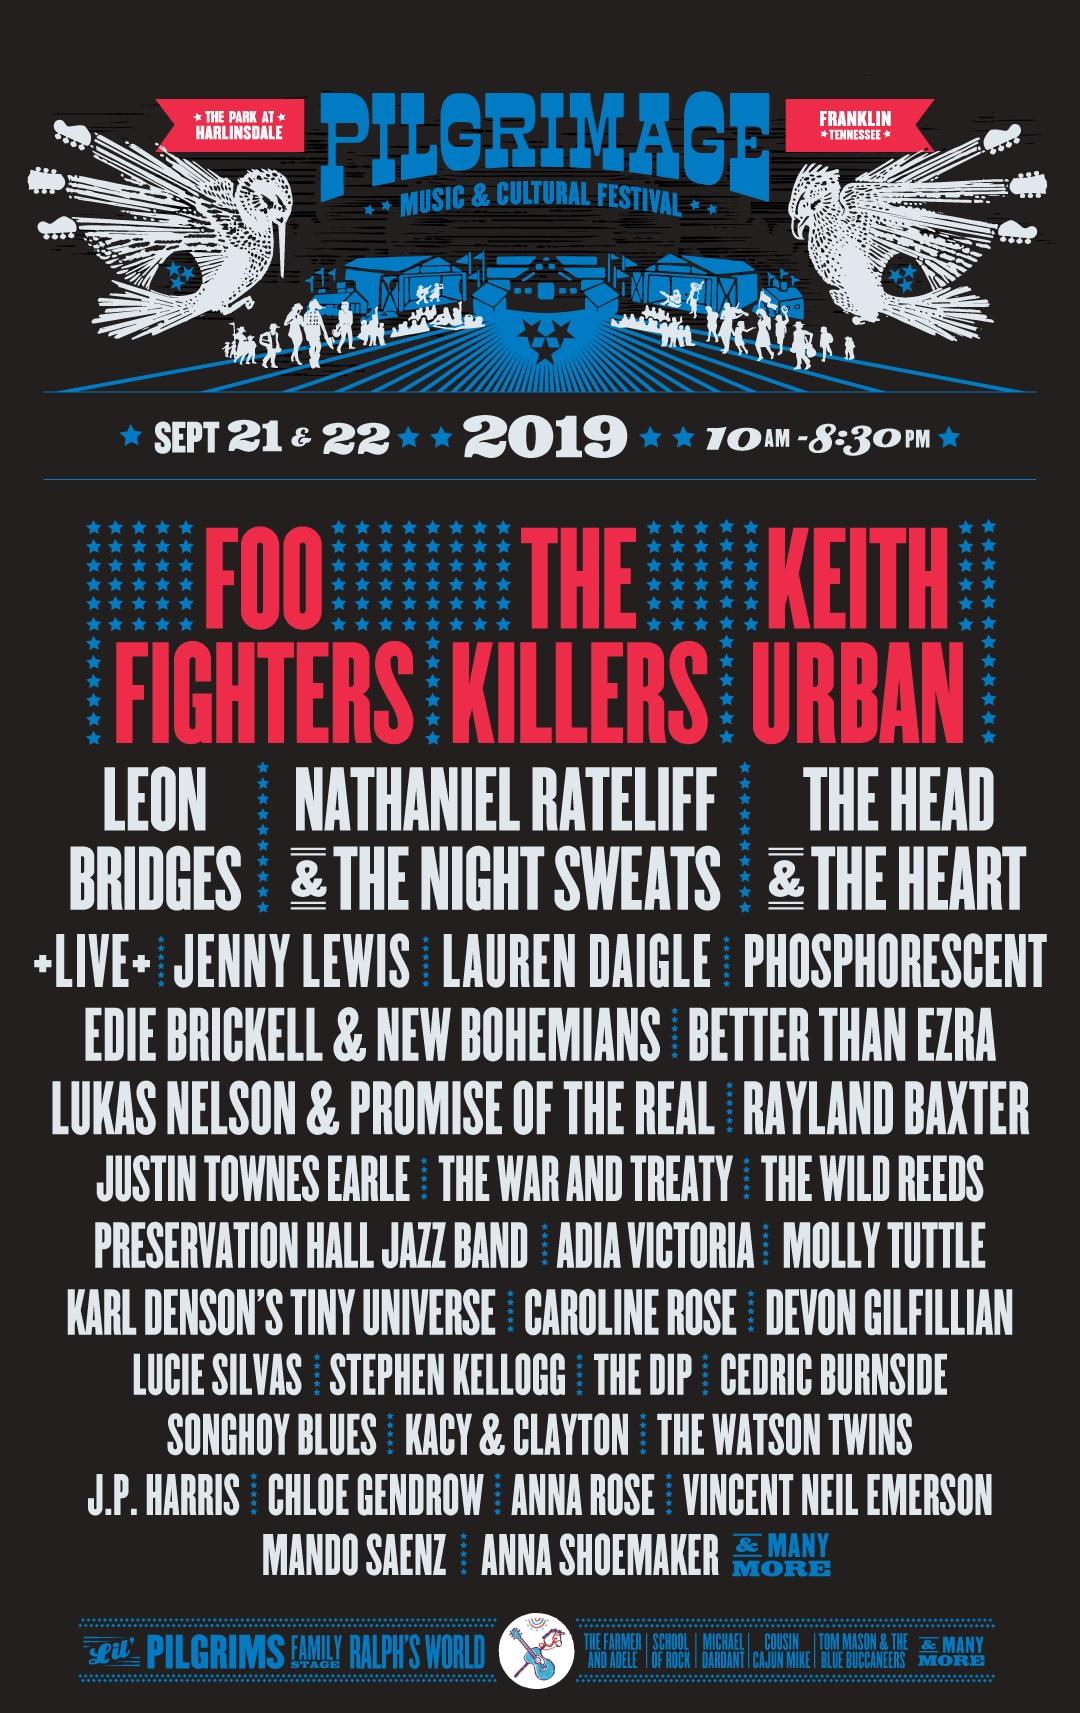 Pilgrimage Music & Cultural Festival Lineup 2019